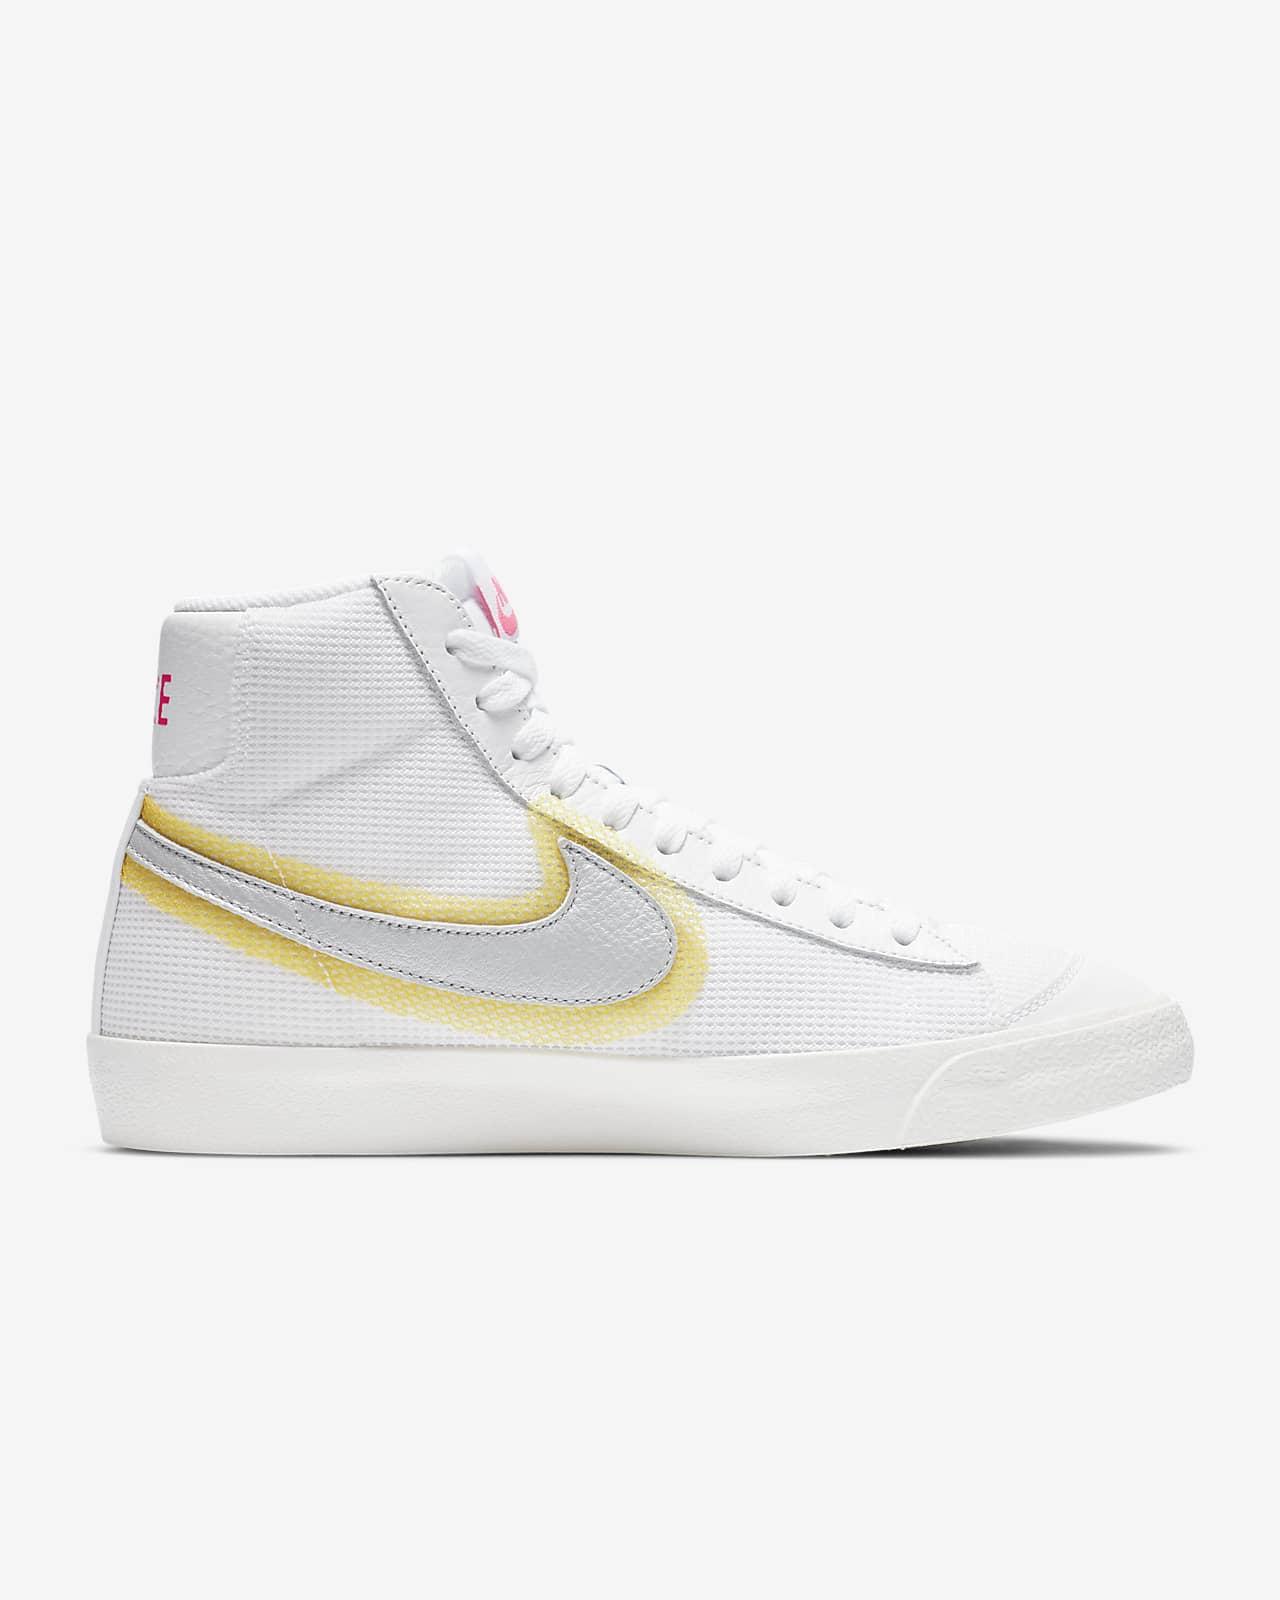 Chaussure Nike Blazer Mid Vintage '77 pour Femme